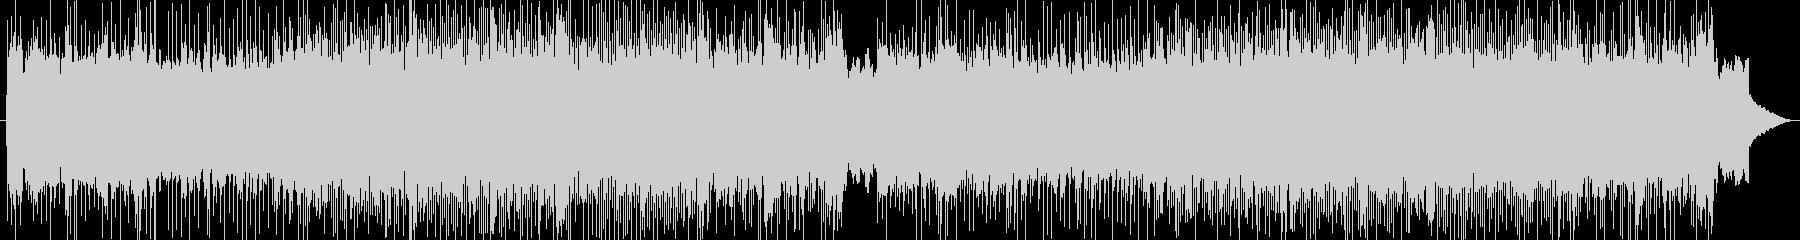 「HR/HM」「ROCK」BGM195の未再生の波形